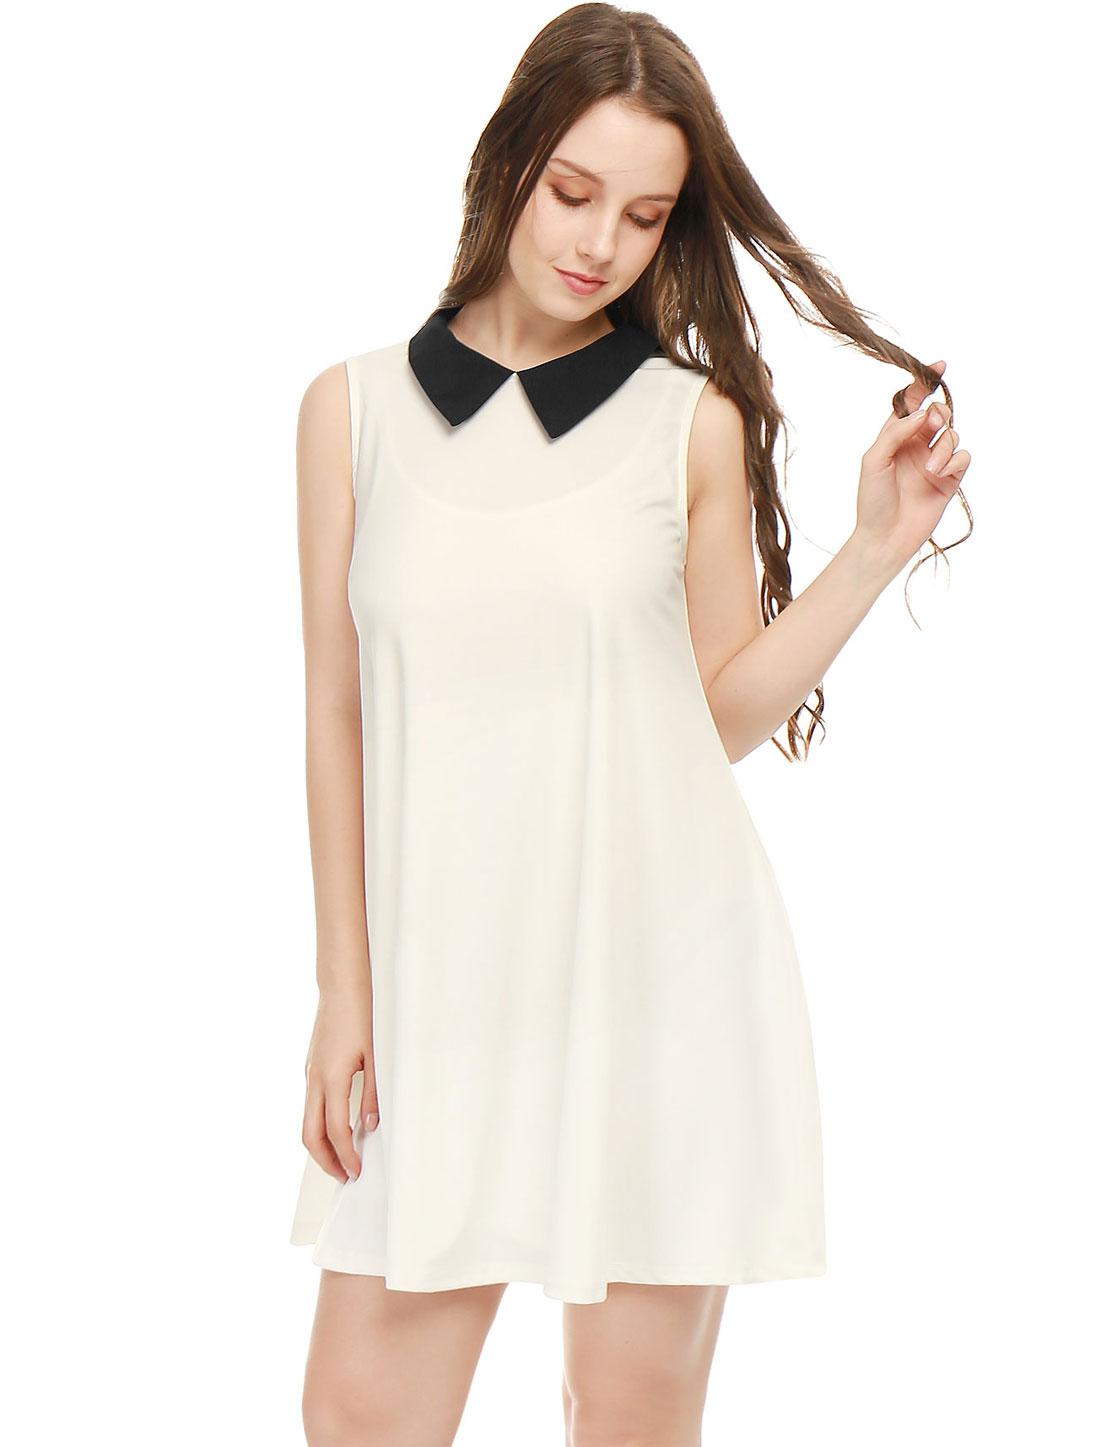 Women Contrast Color Peter Pan Collar Sleeveless Swing Dress White XL